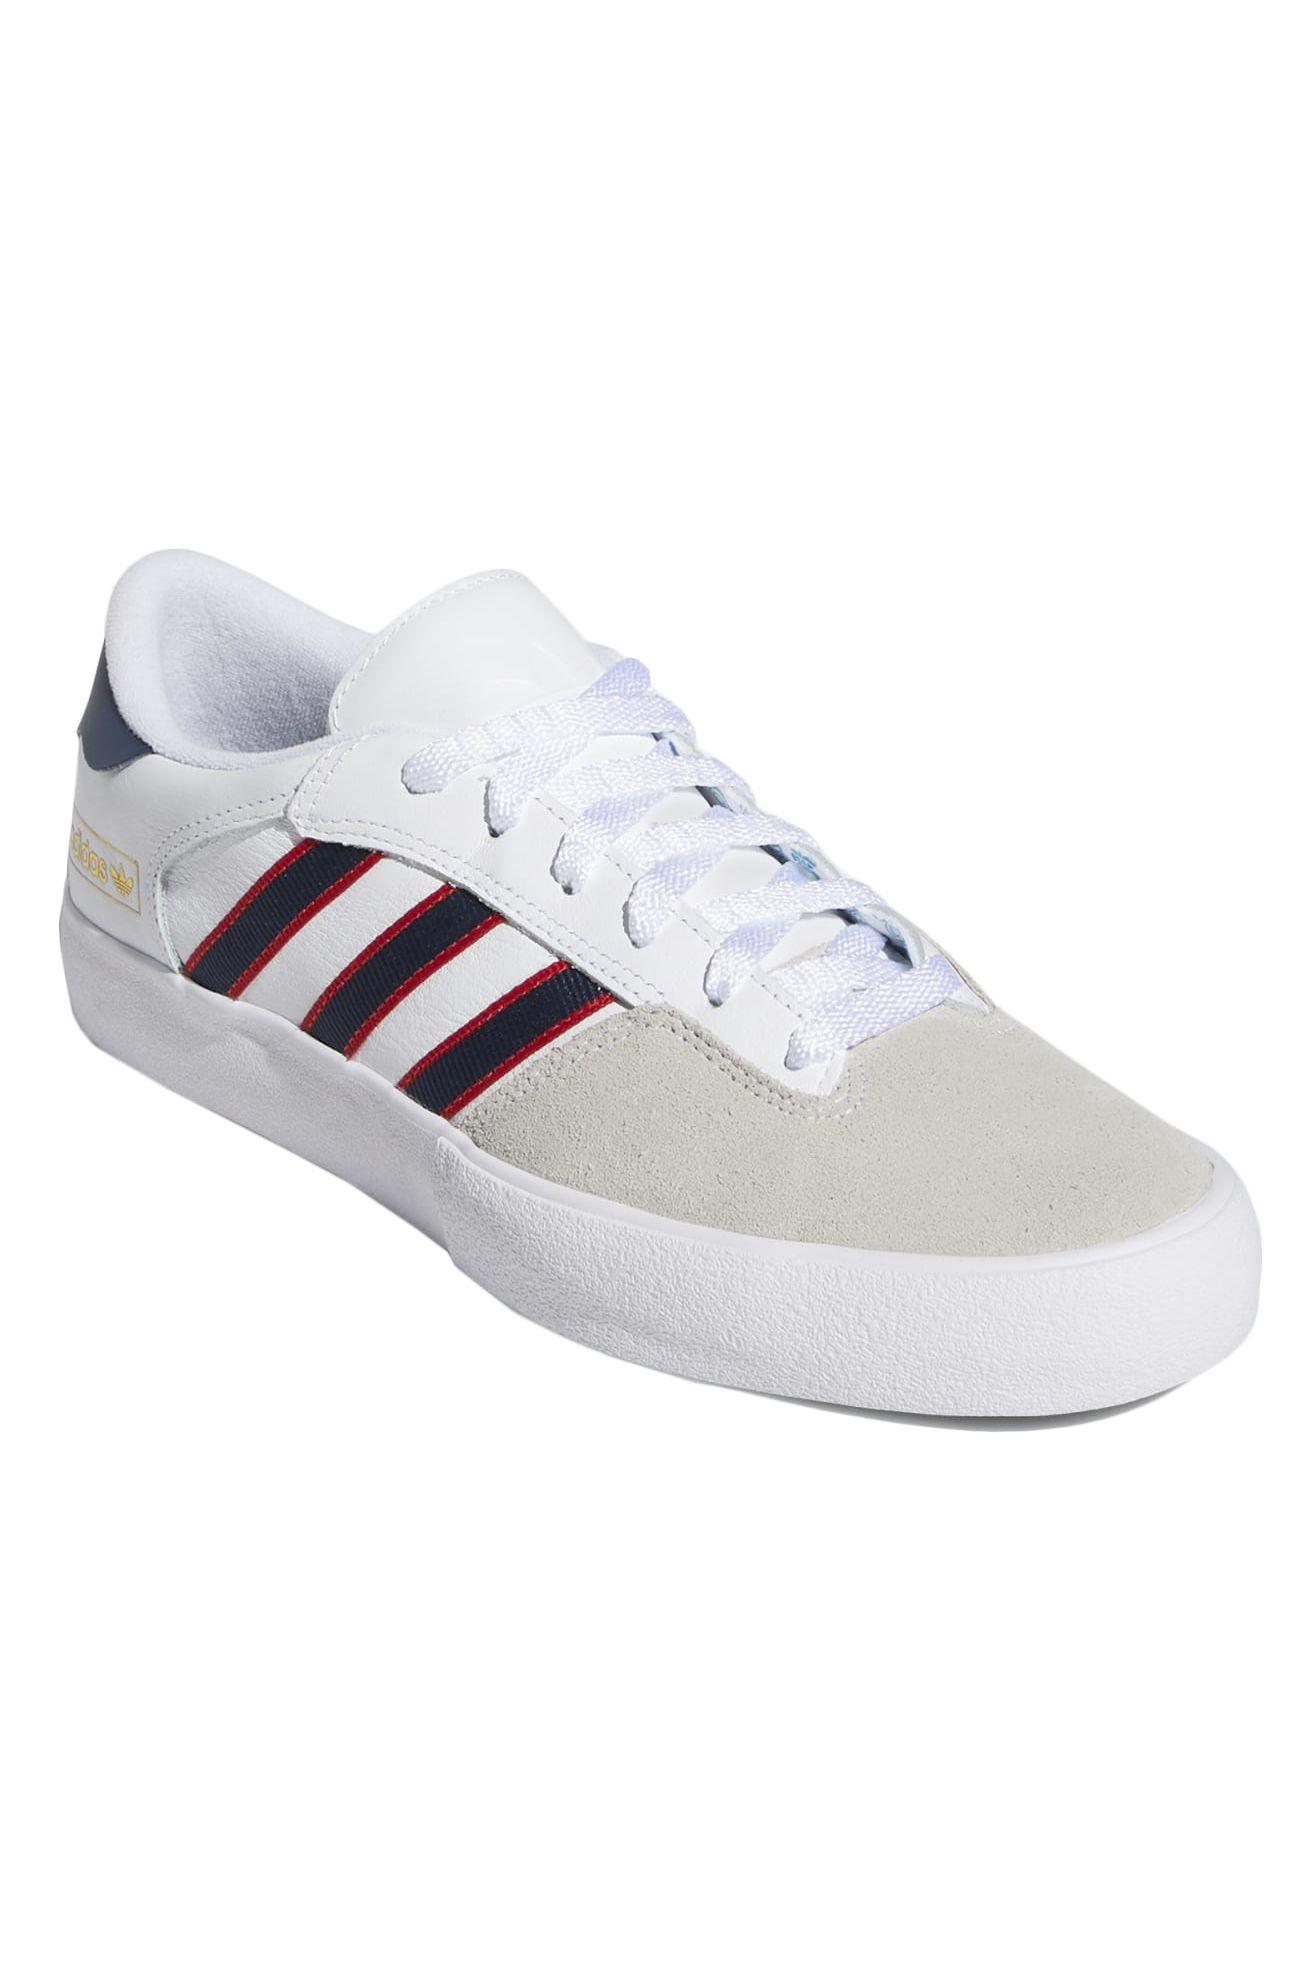 Tenis Adidas MATCHBREAK SUPER Ftwr White/Collegiate Navy/Scarlet